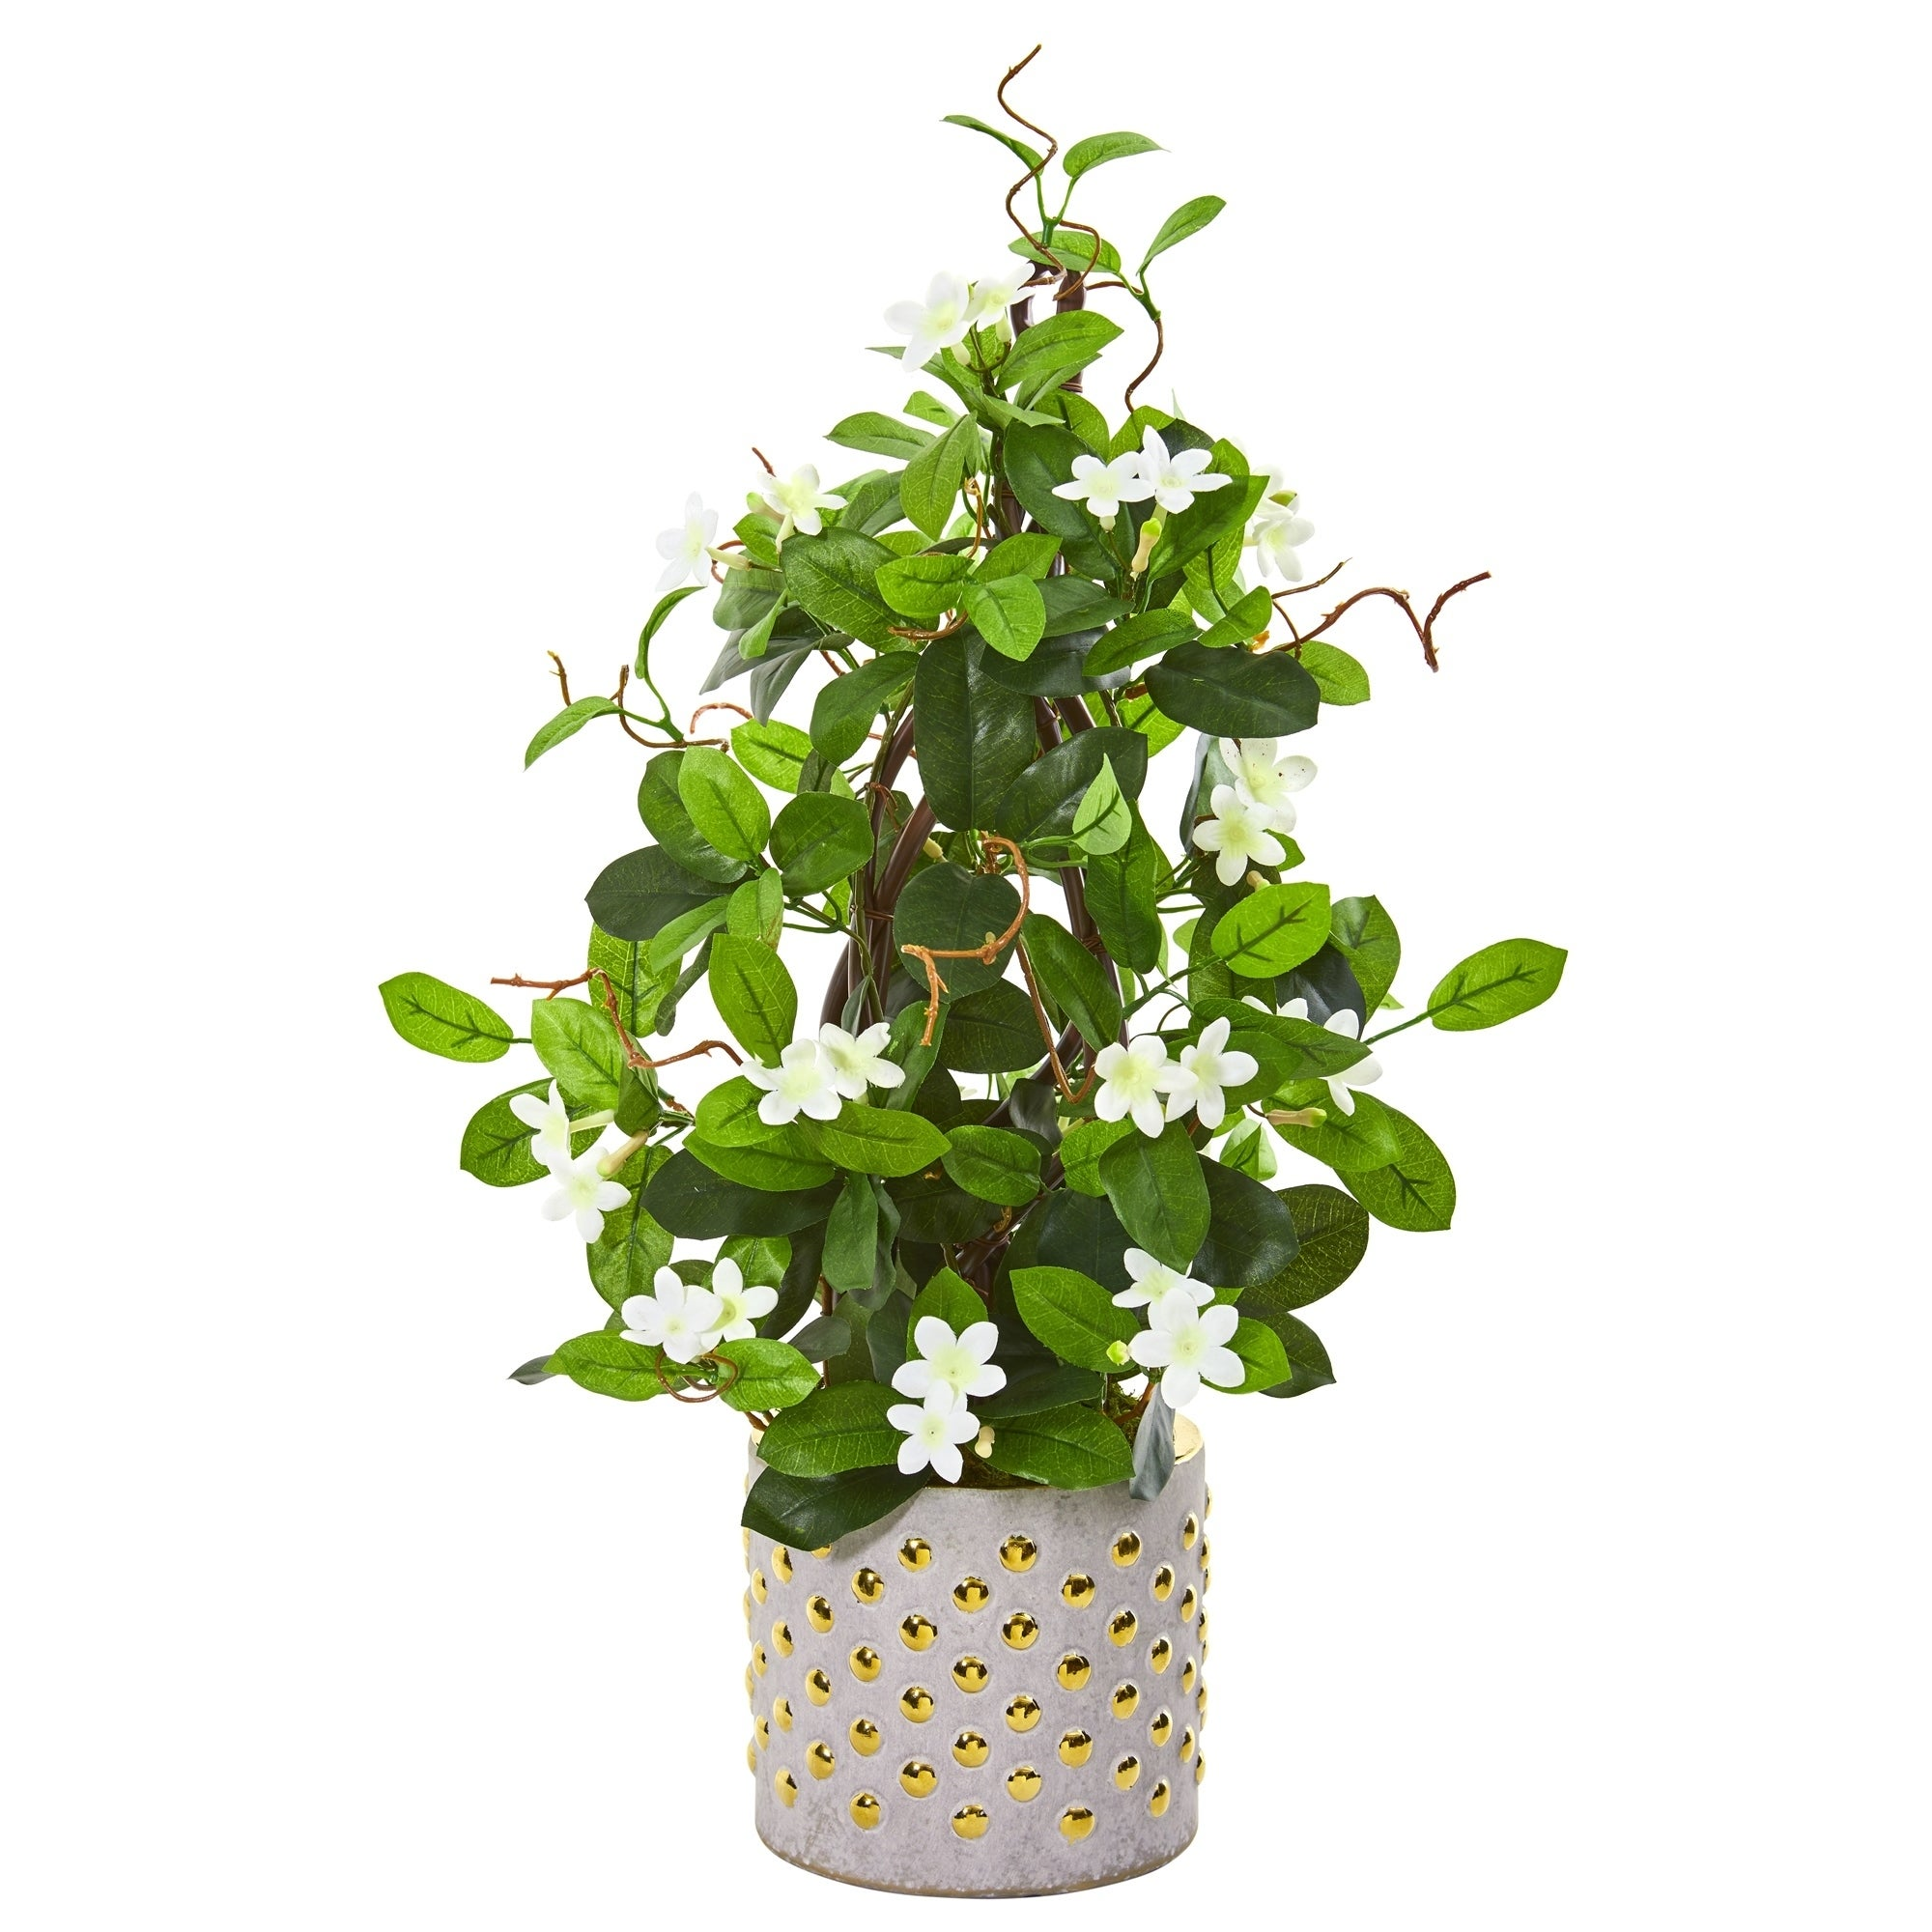 25 Stephanotis Artificial Climbing Plant In Designer Planter On Sale Overstock 27664440